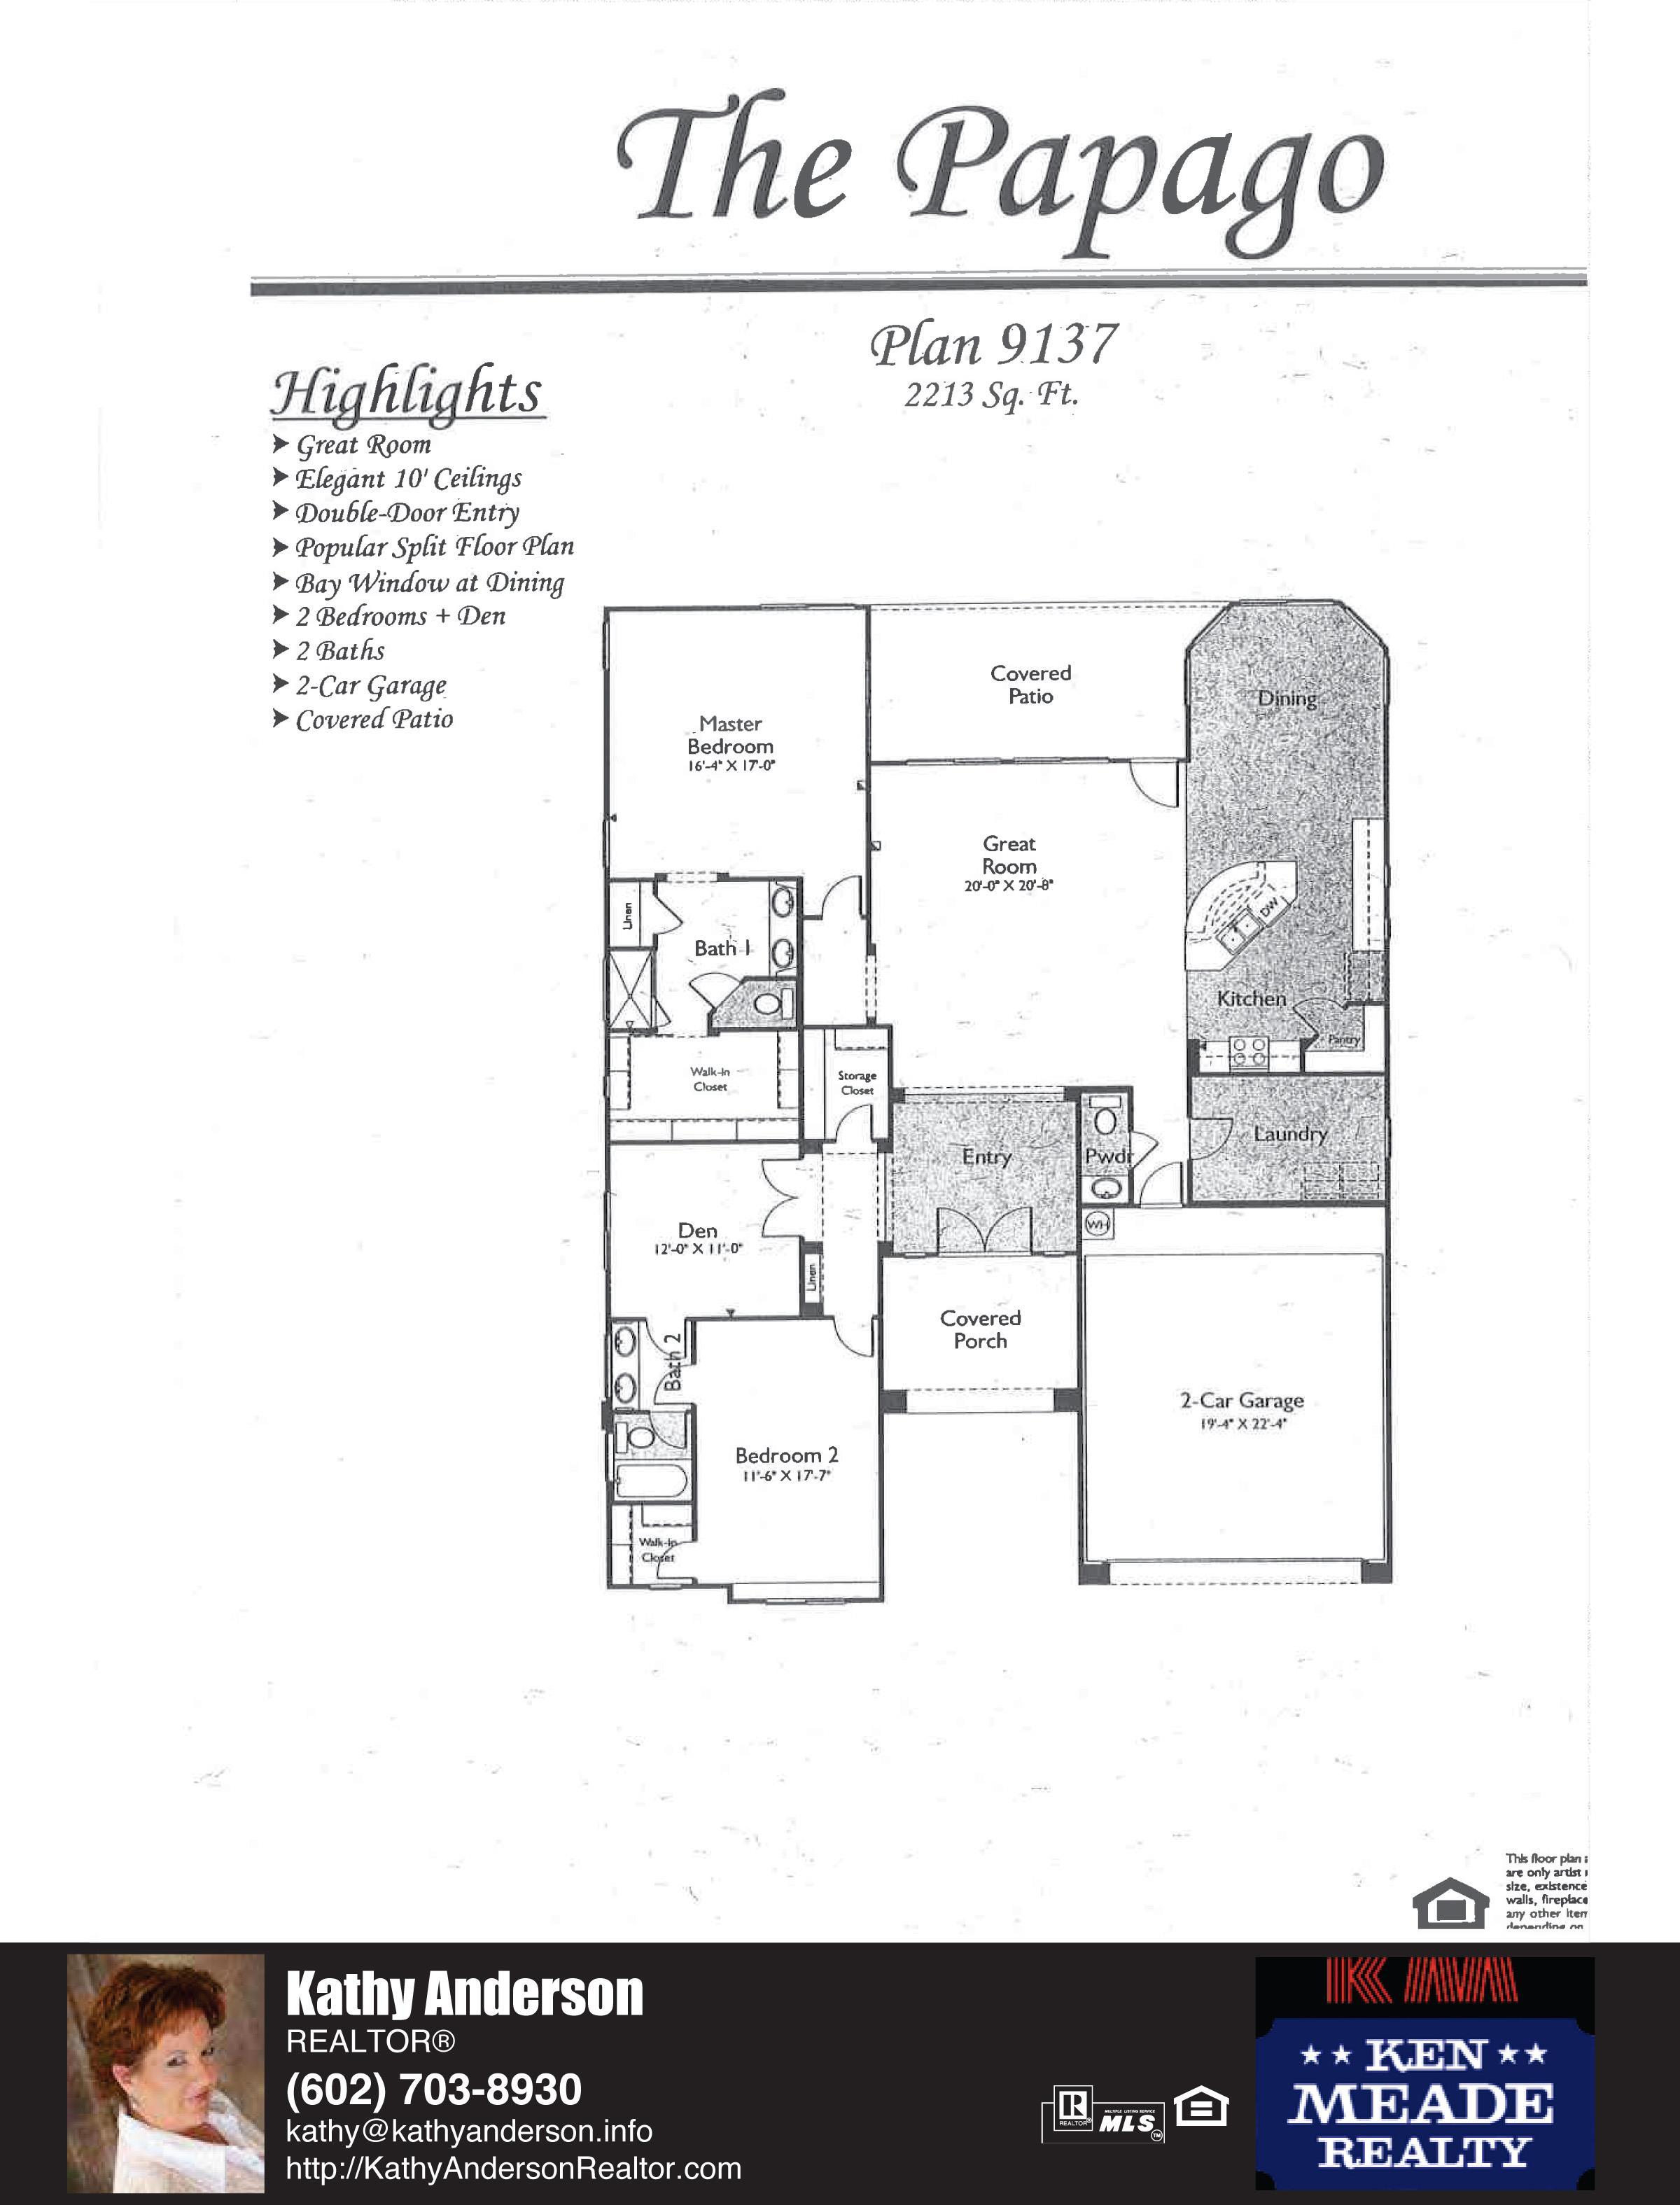 Arizona Traditions PapagoFloor Plan Model Home Plans Floorplans Models in Surprise Arizona AZ Top Ken Meade Realty Realtor agent Kathy Anderson